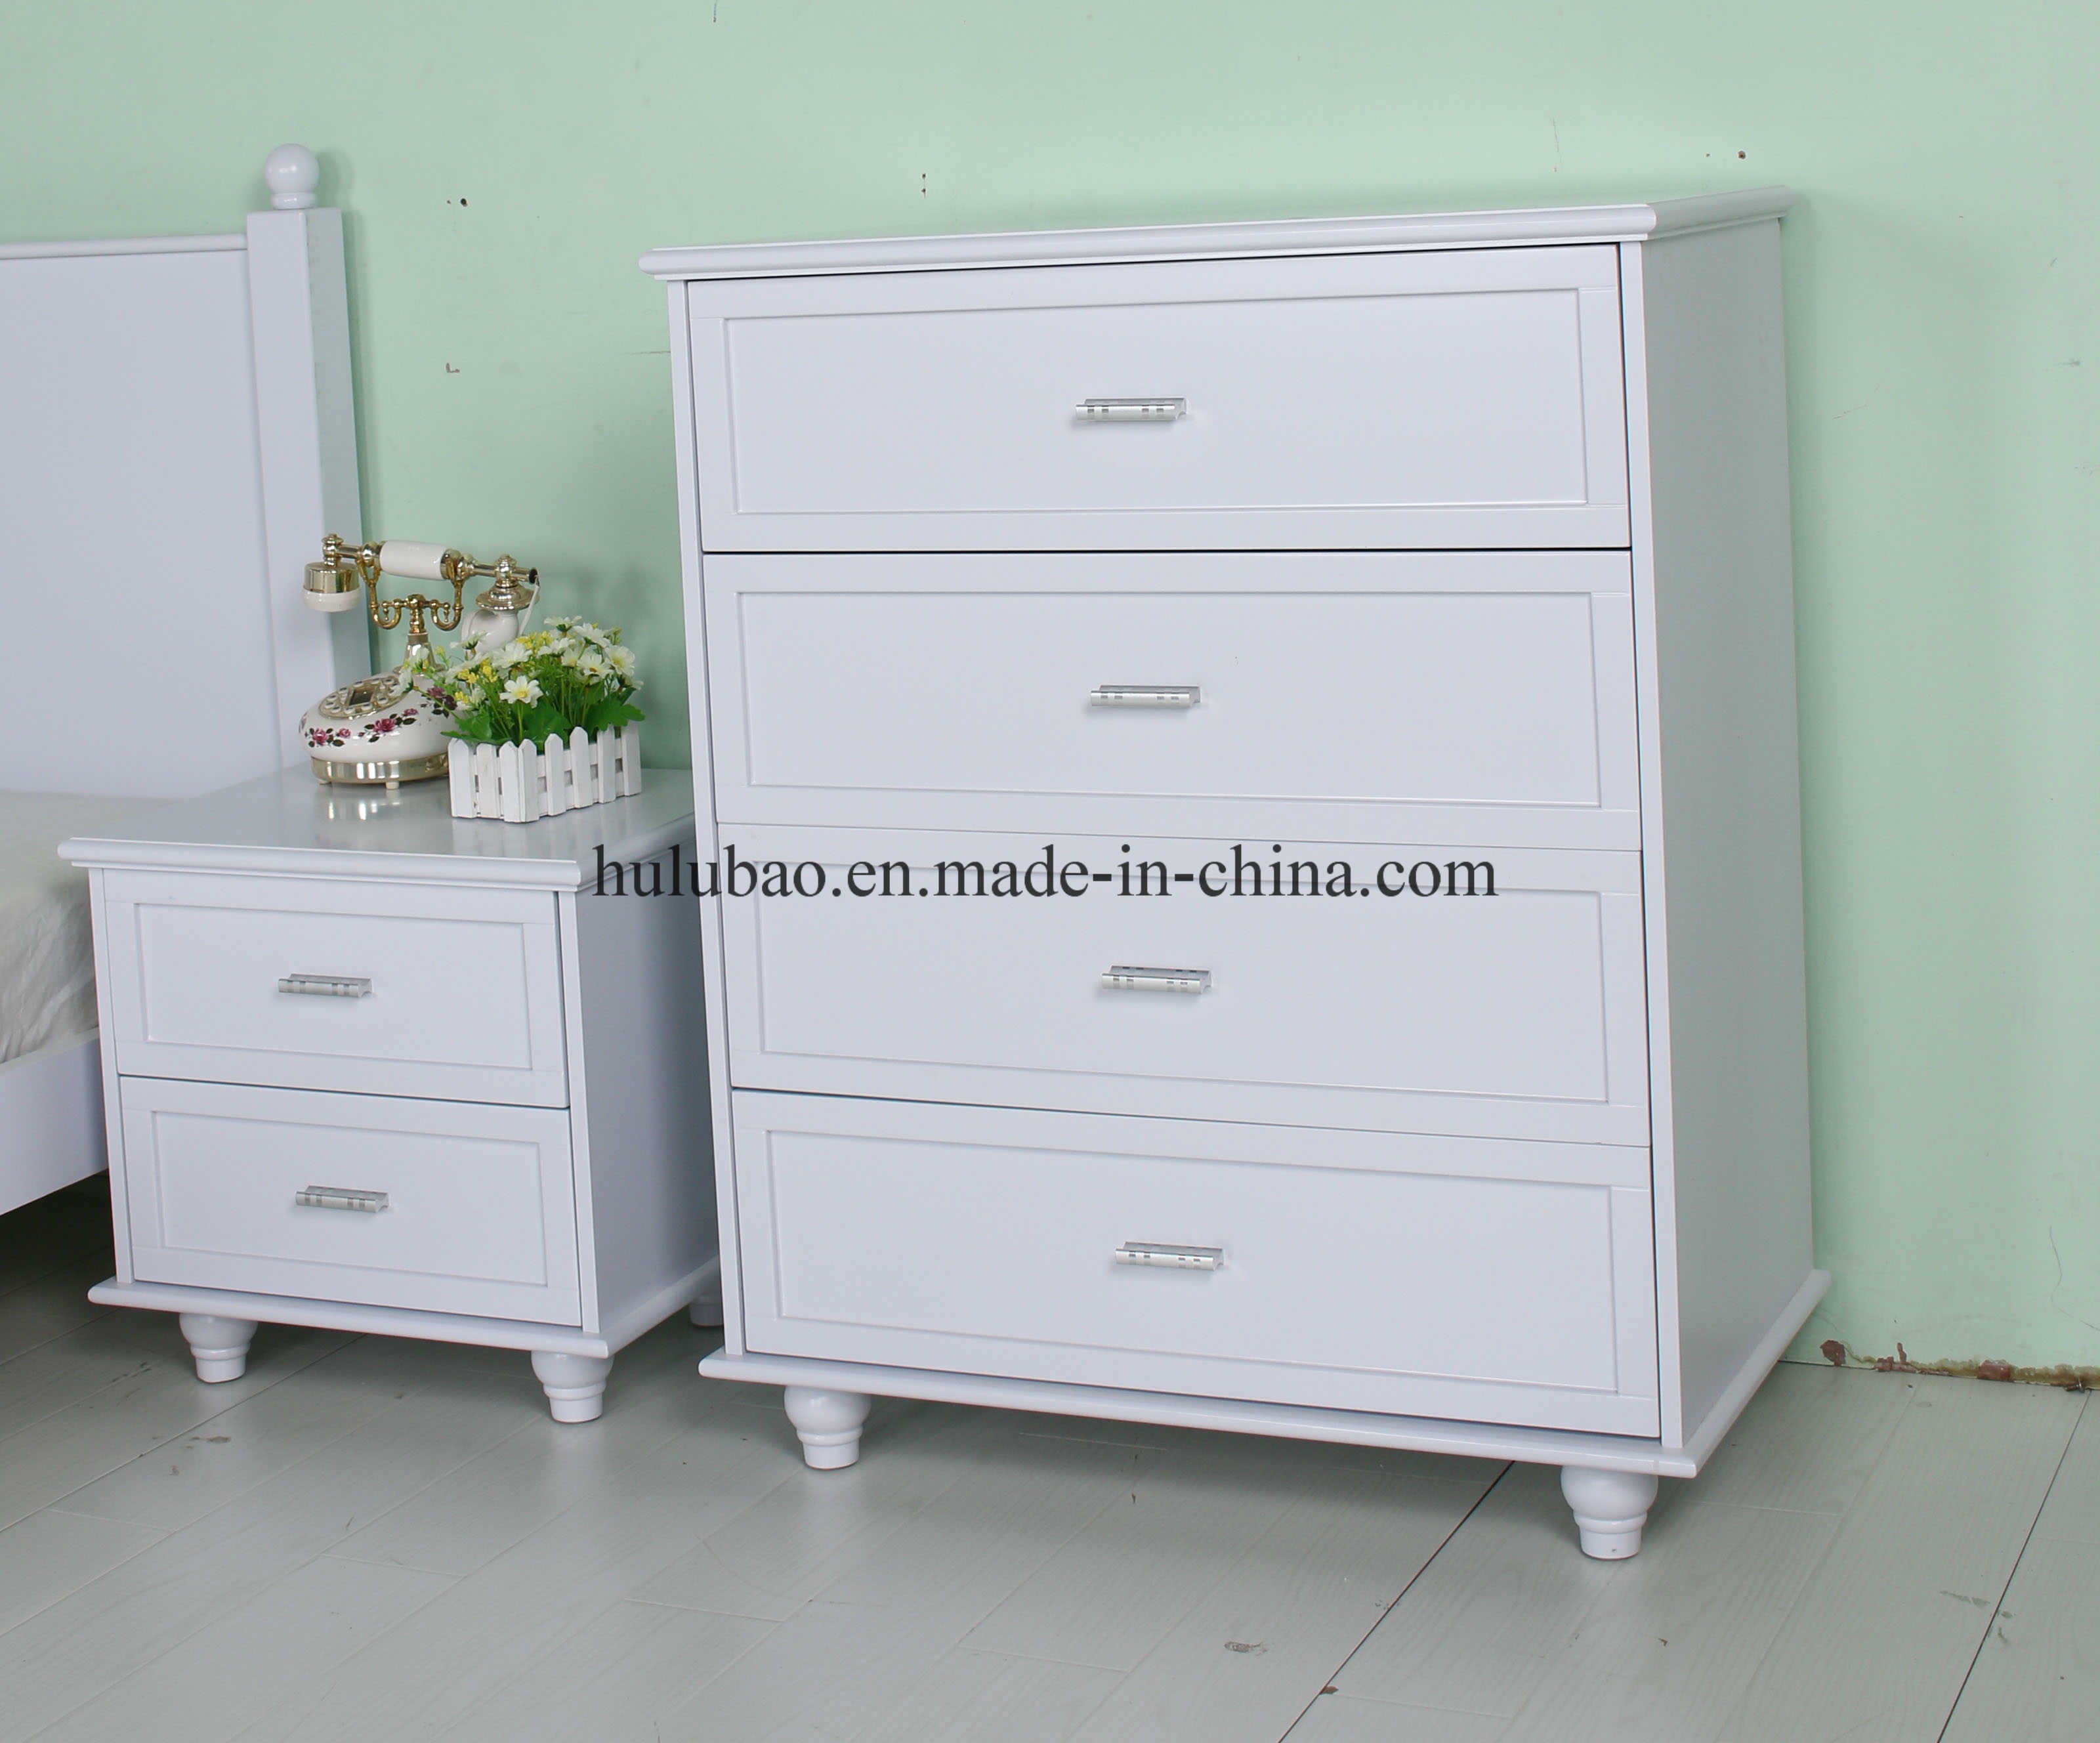 China Factory Design Korean Style Kids Furniture for Hotel Bedroom Set (1532A)